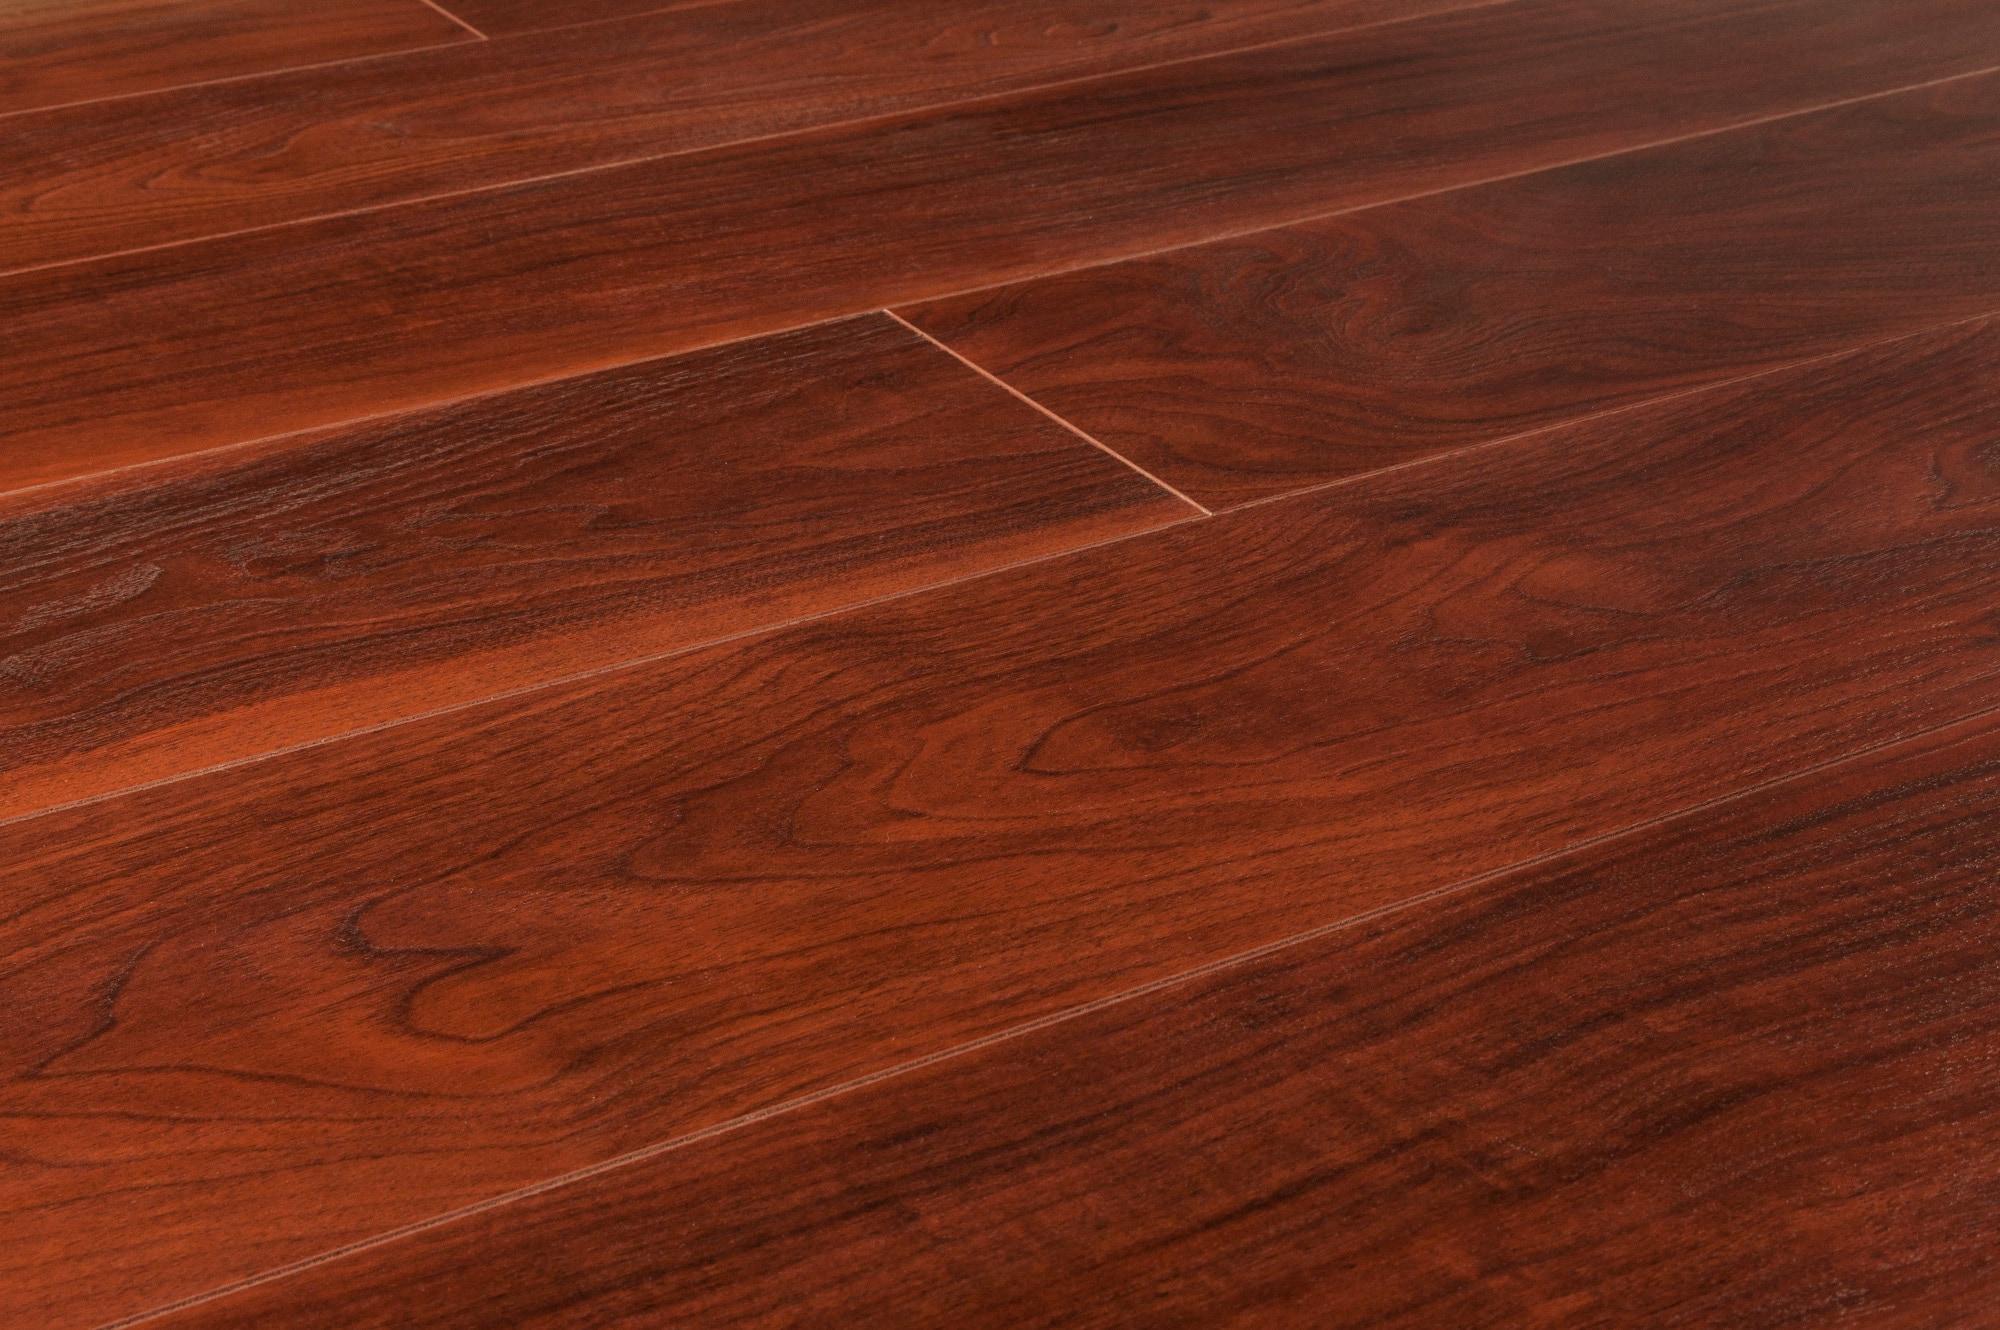 Lamton laminate 12mm american walnut collection prime rose for Walnut laminate flooring